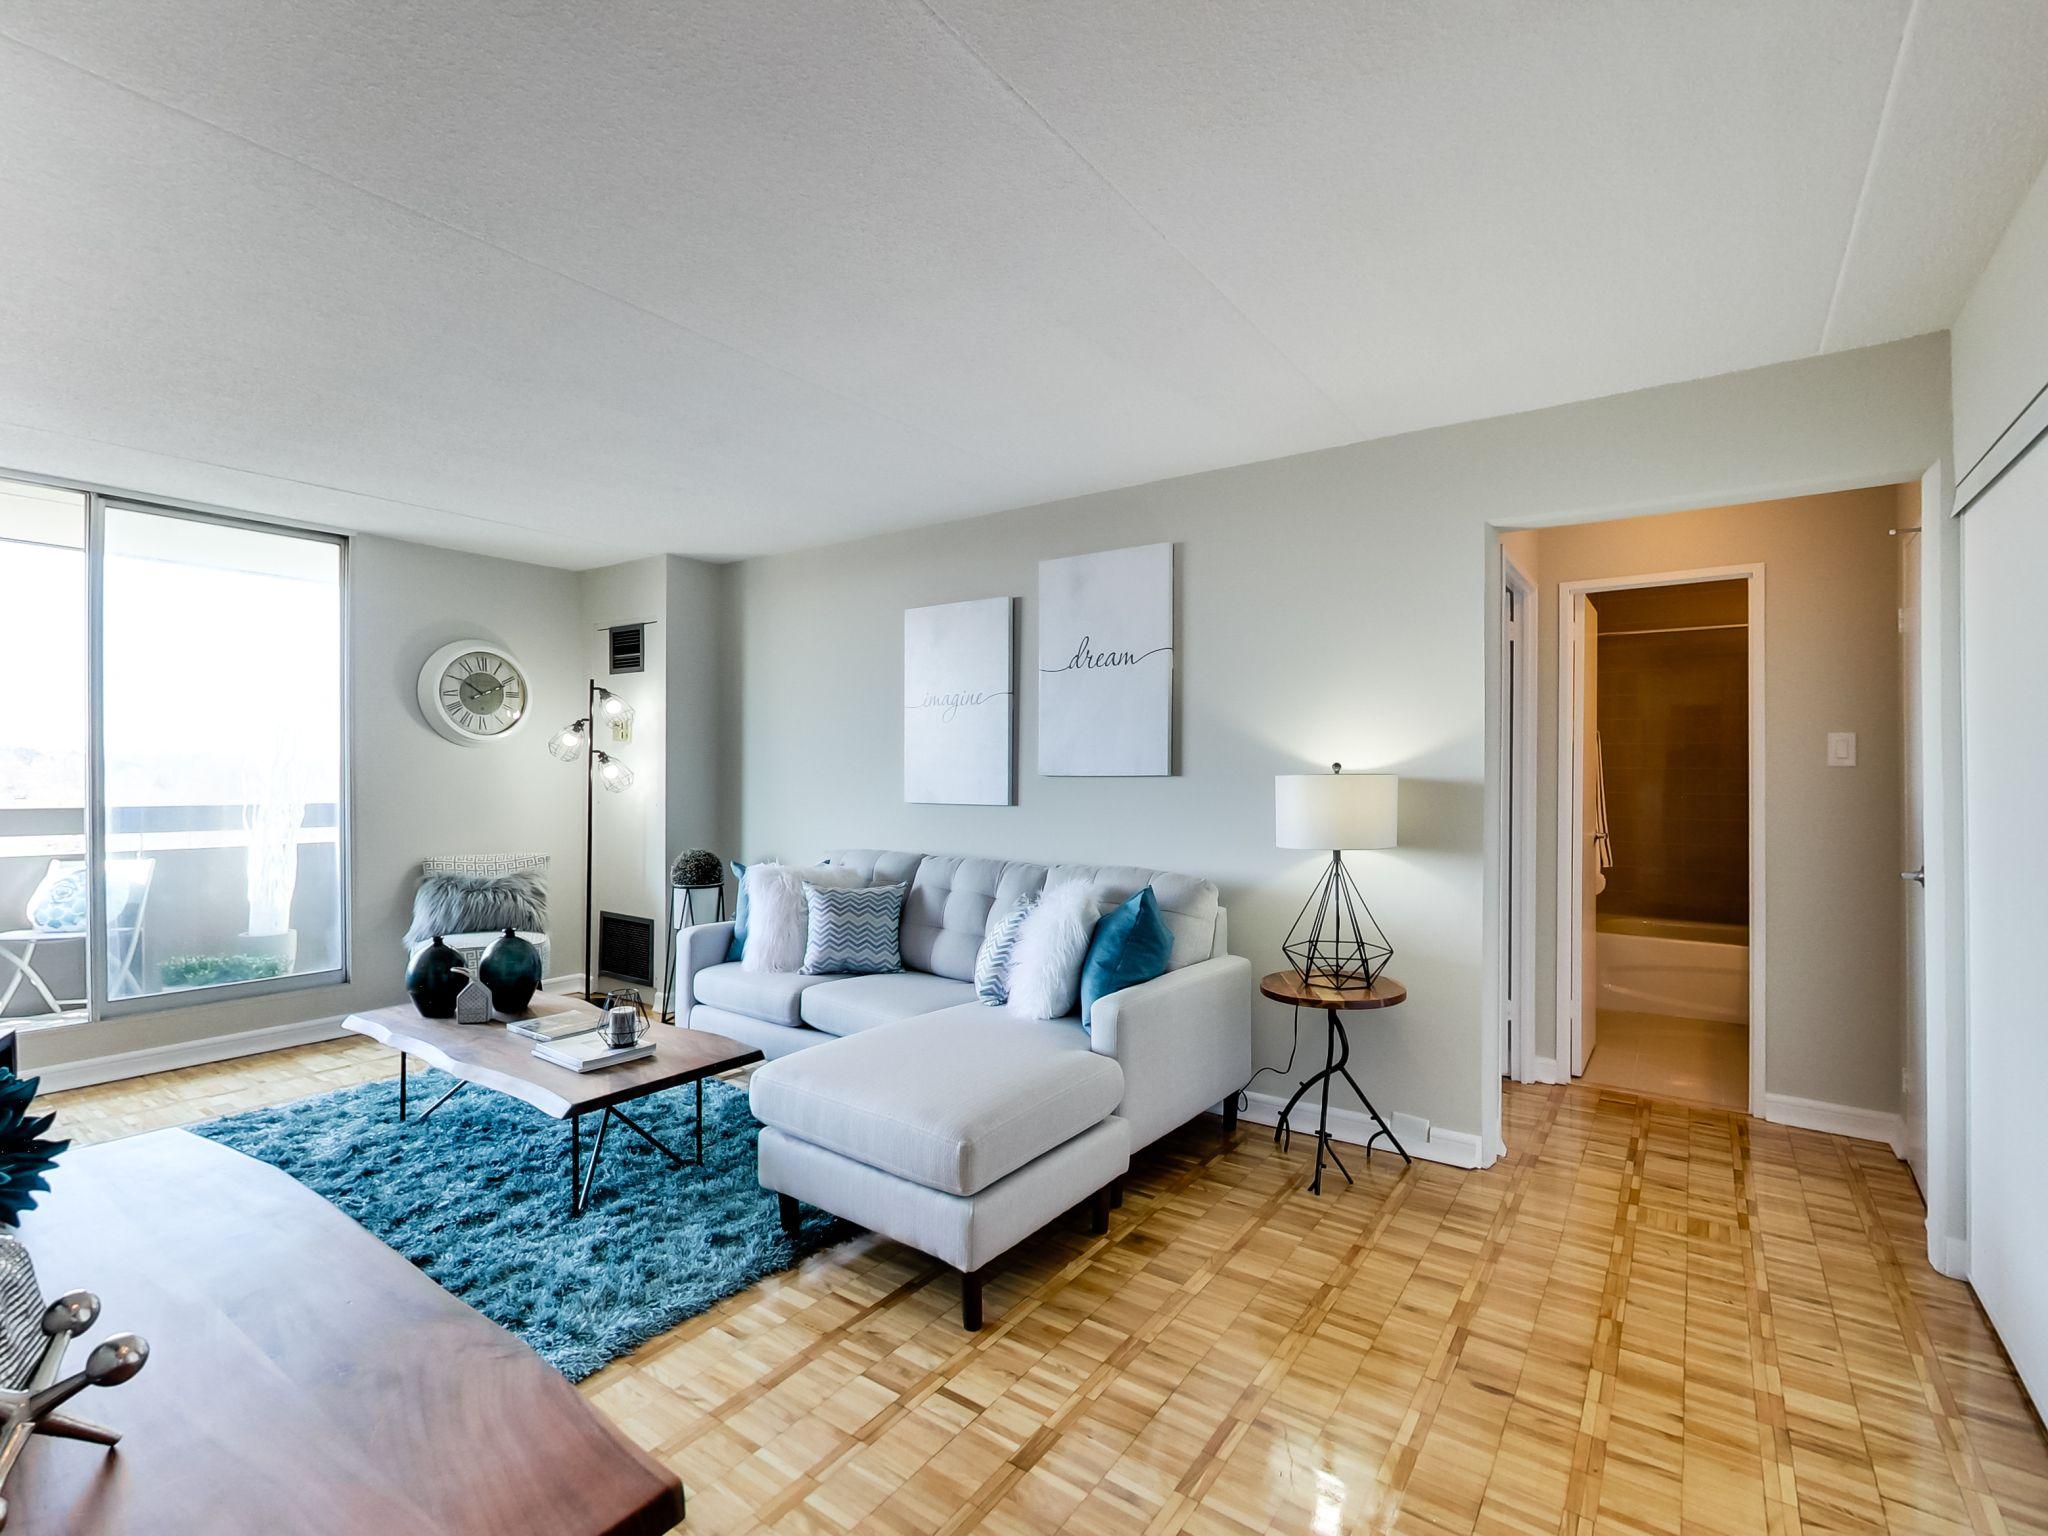 Apartment For Rent At 2150 Bromsgrove Road Southdown Rd Royal Windsor Dr O Shanter Development Company Ltd